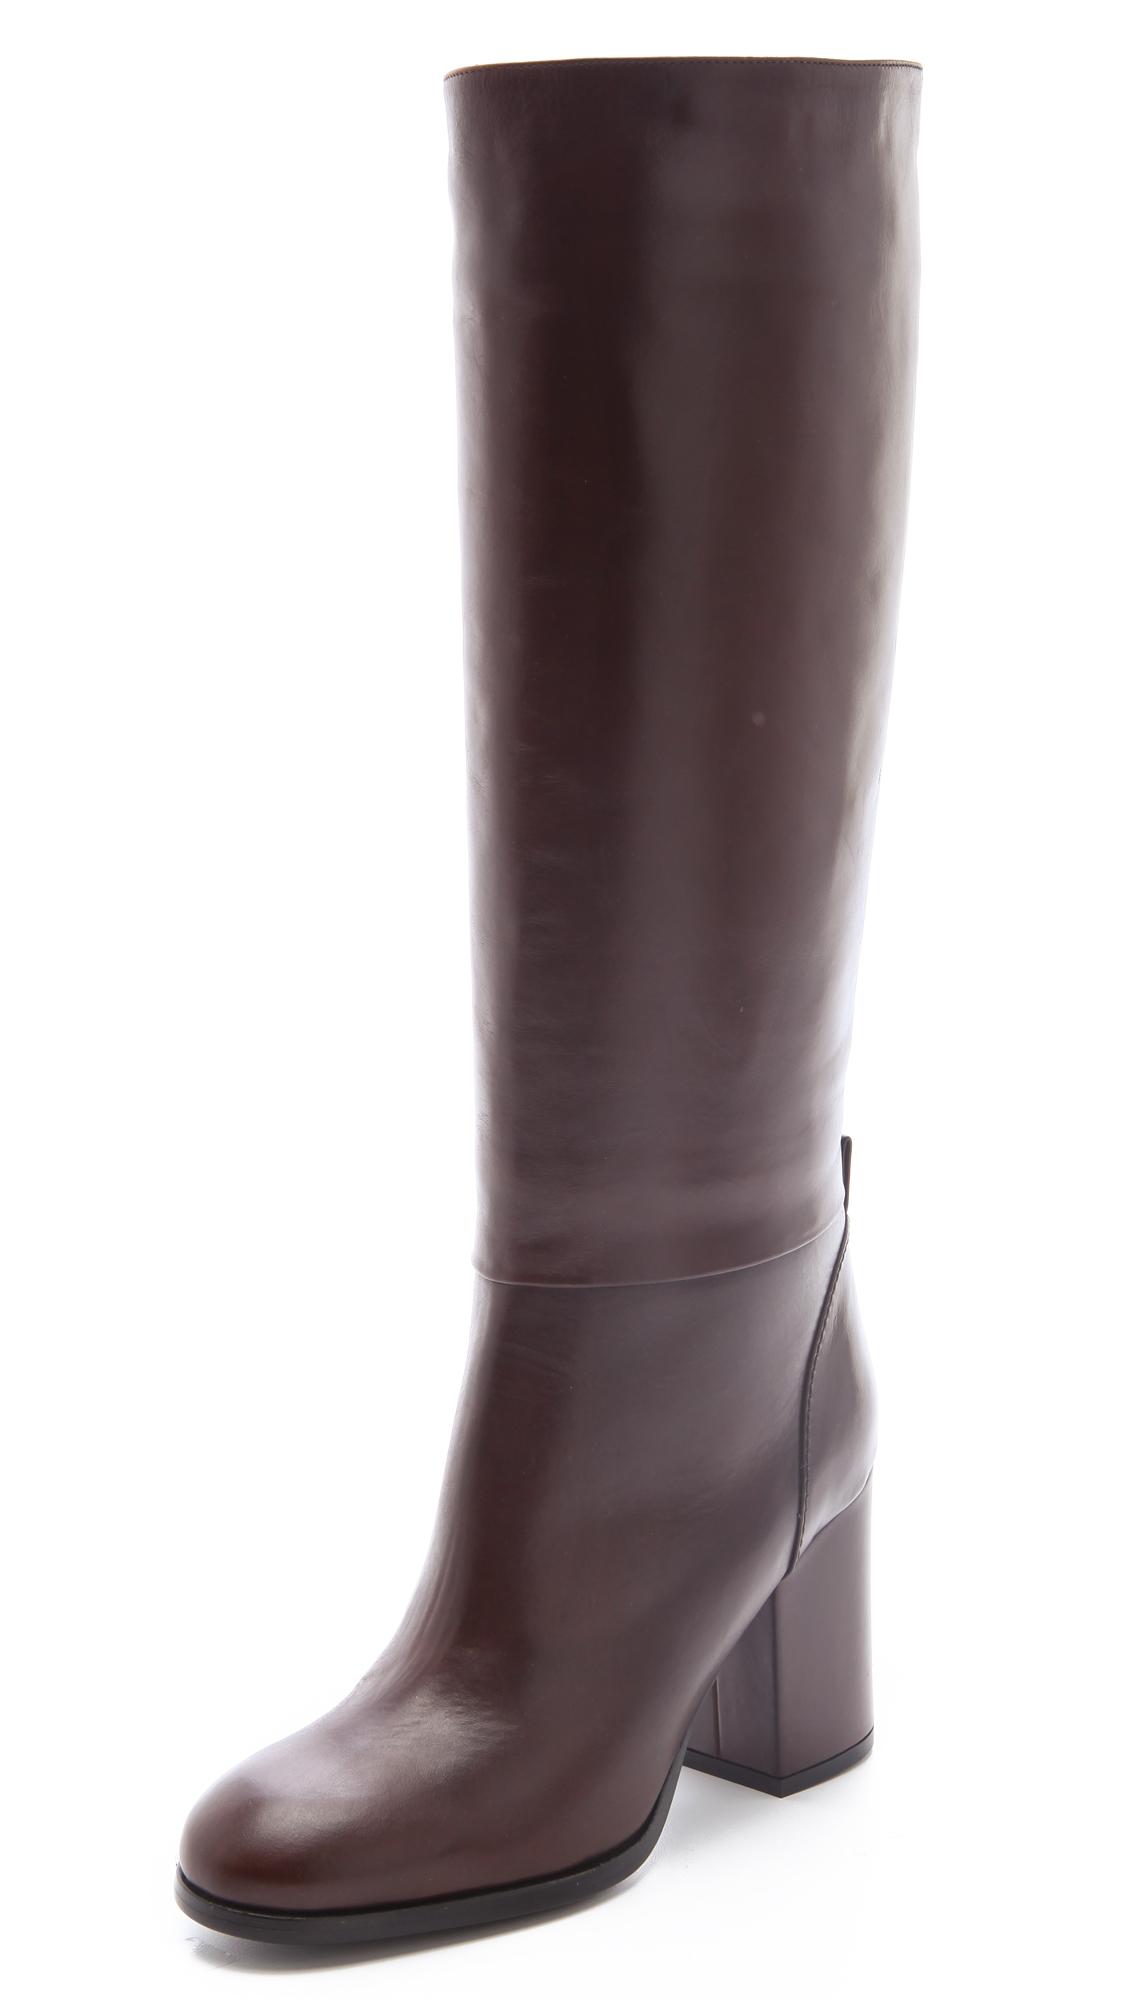 jil sander navy knee high heeled boots in brown lyst